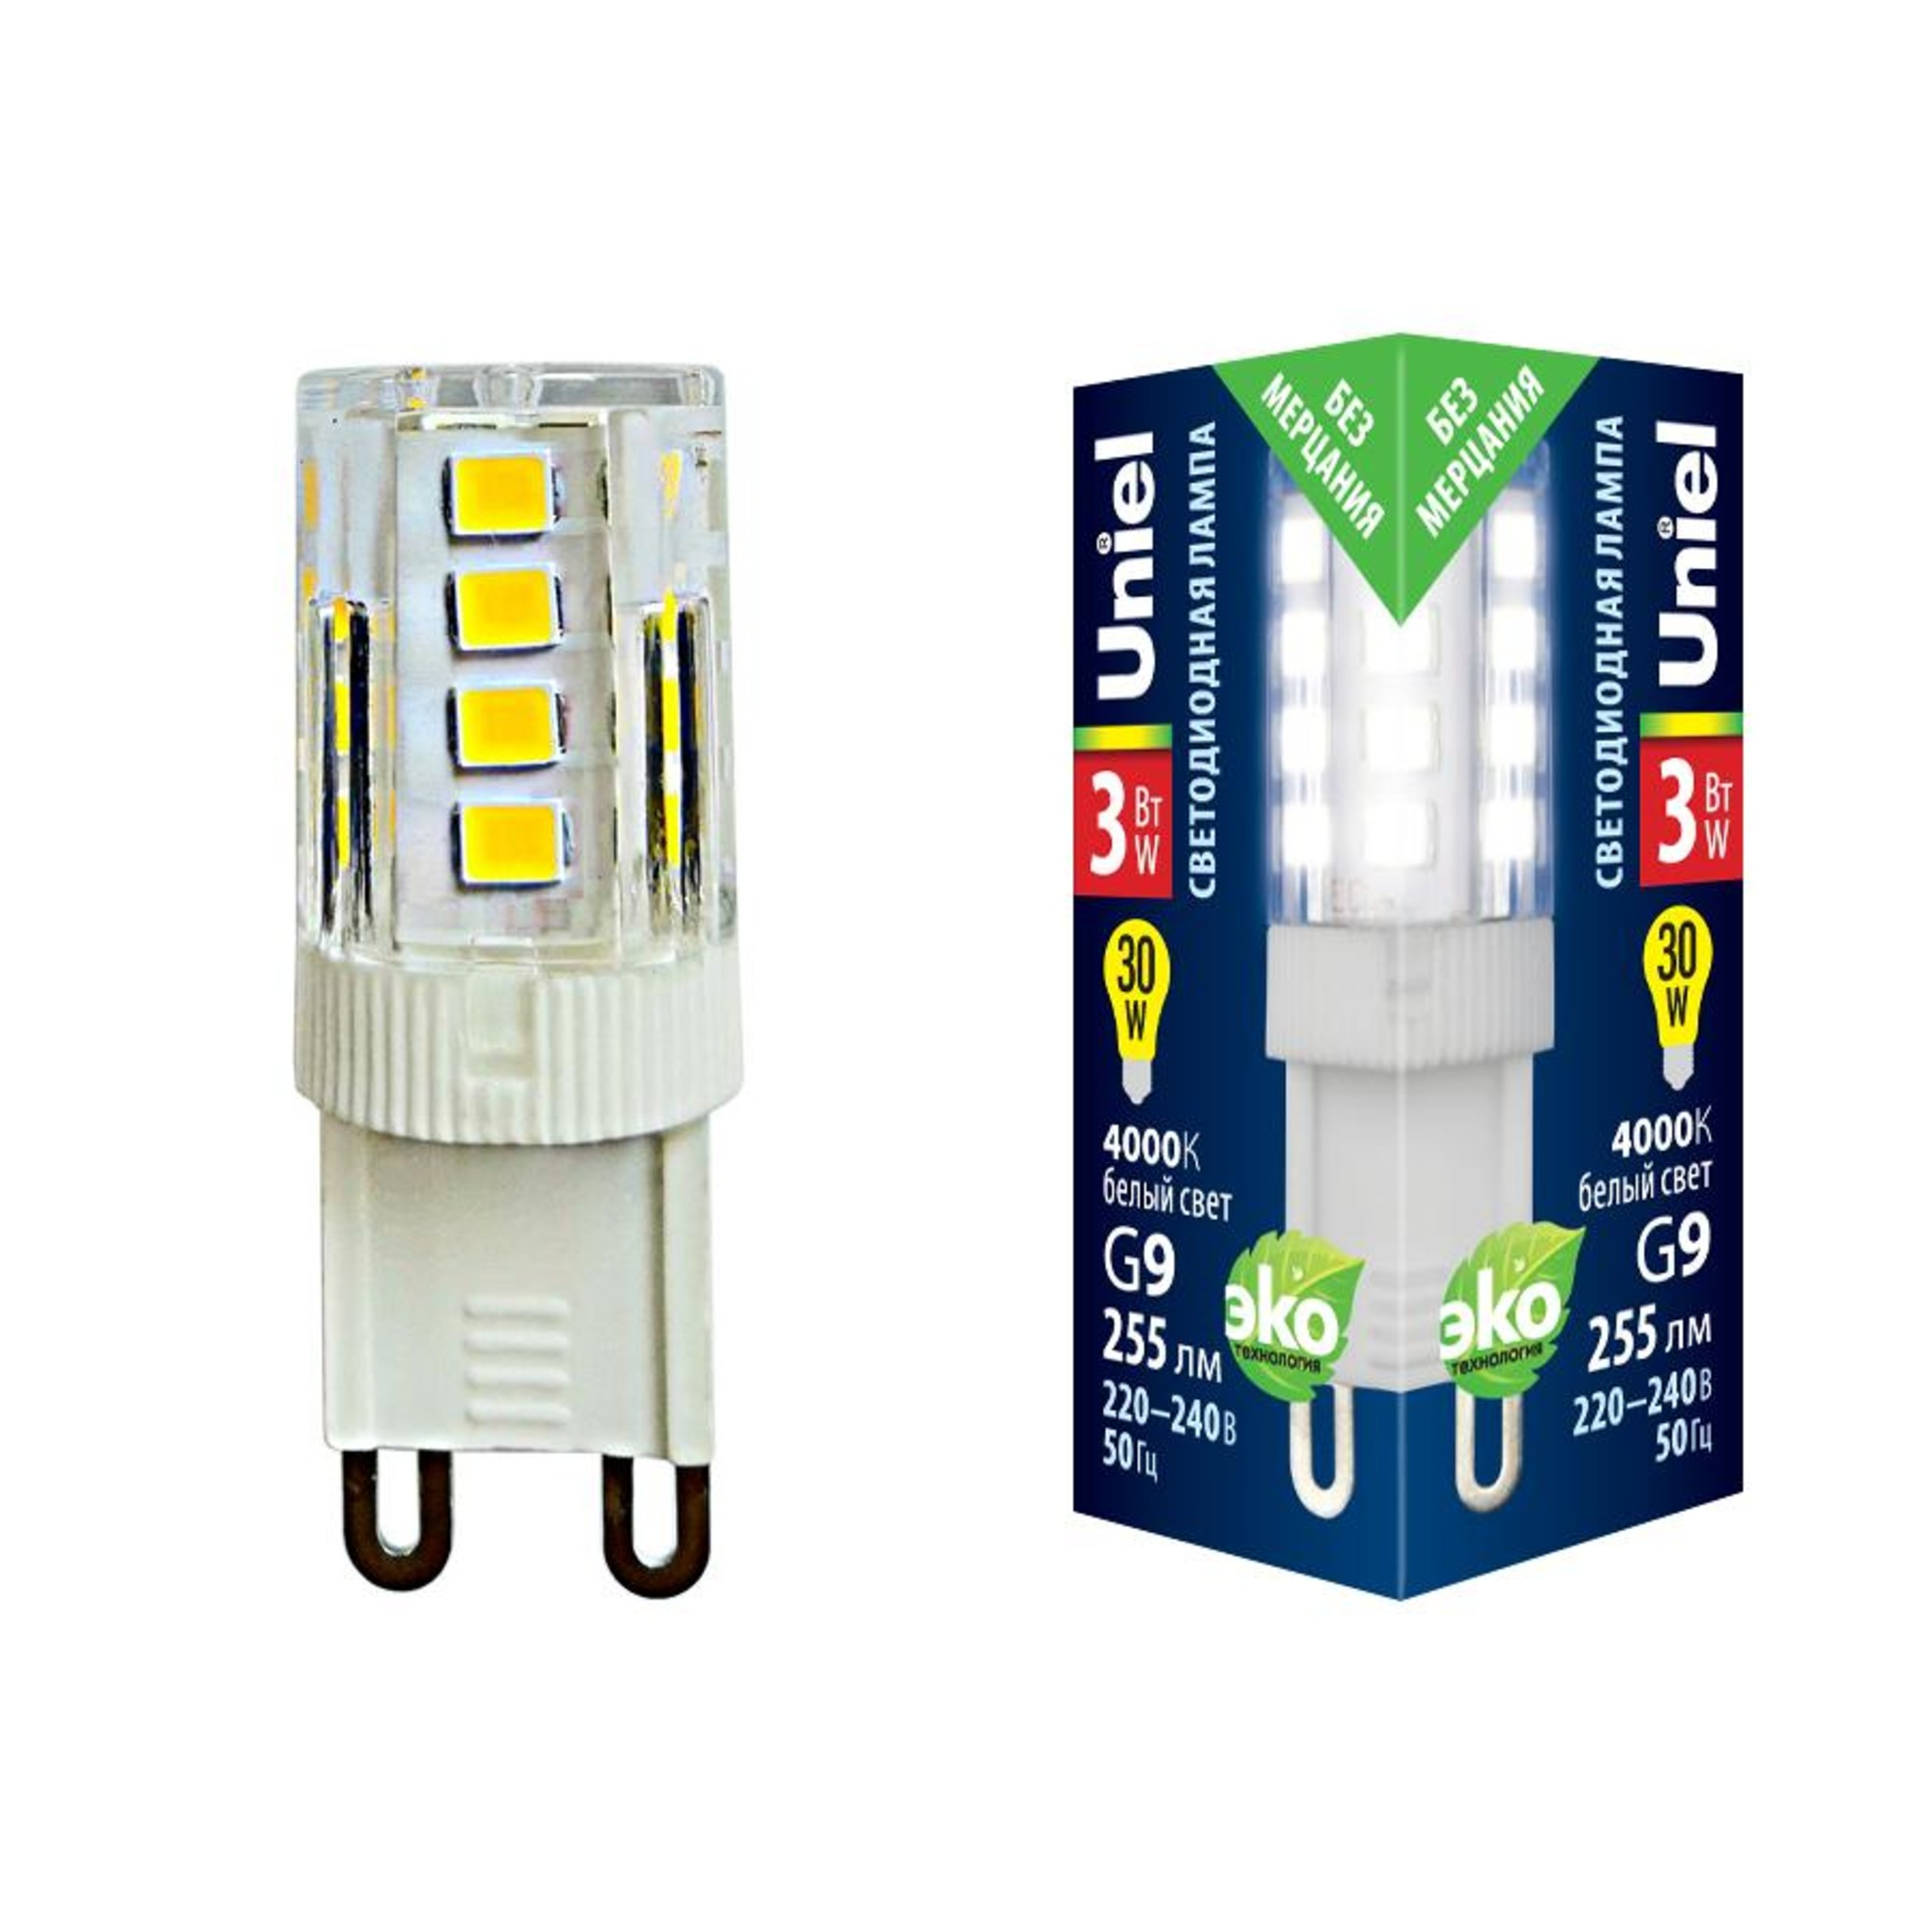 Лампа Volpe светодиодная G9 3 Вт белый свет